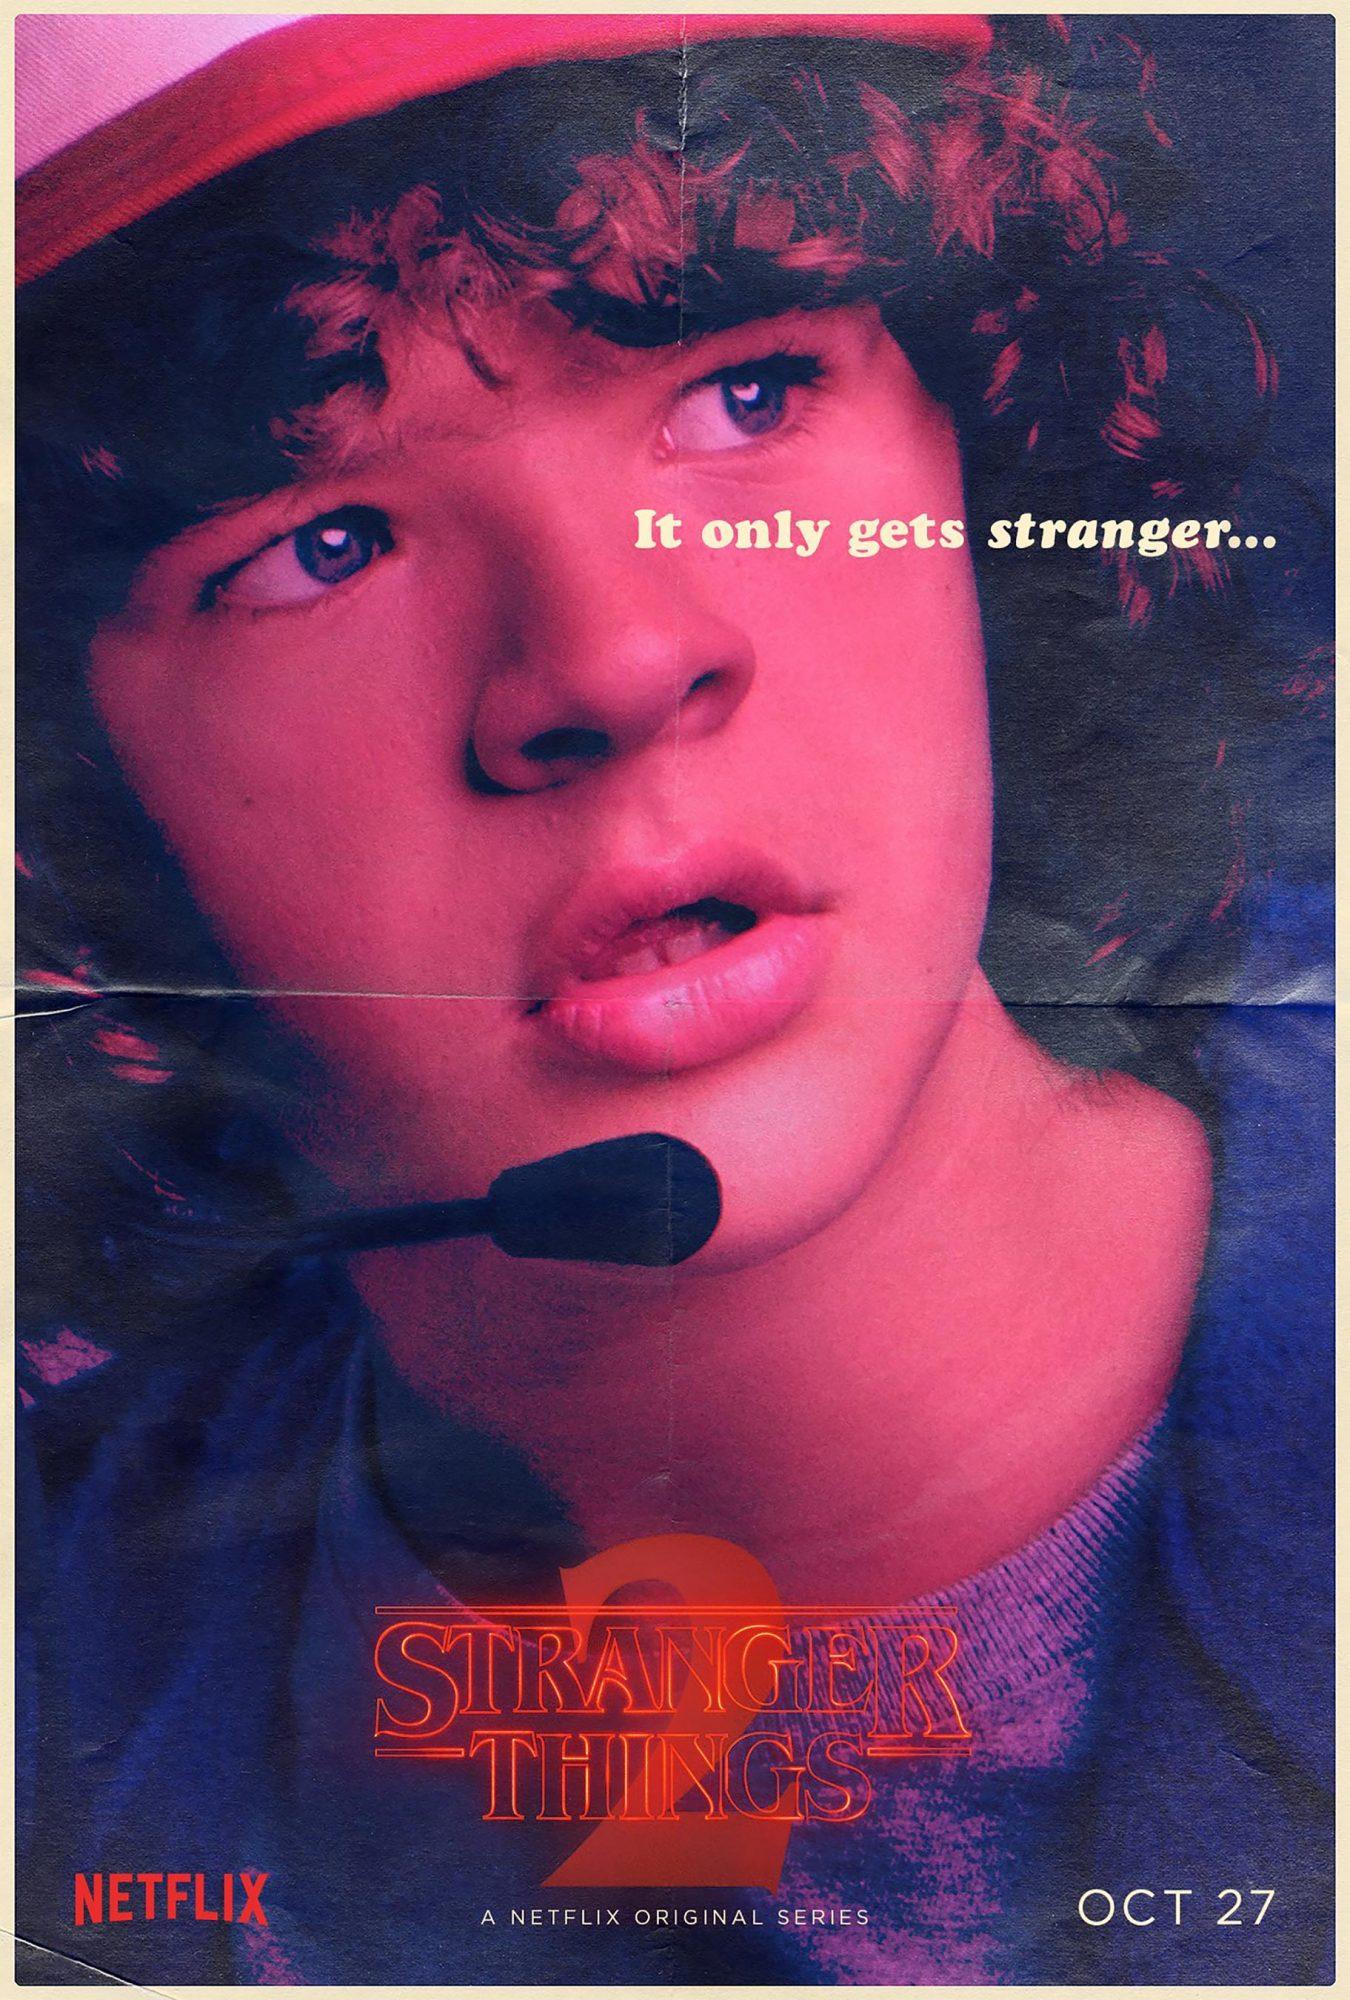 Stranger Things Season 2 - Gaten Matarazzo CR: Netflix